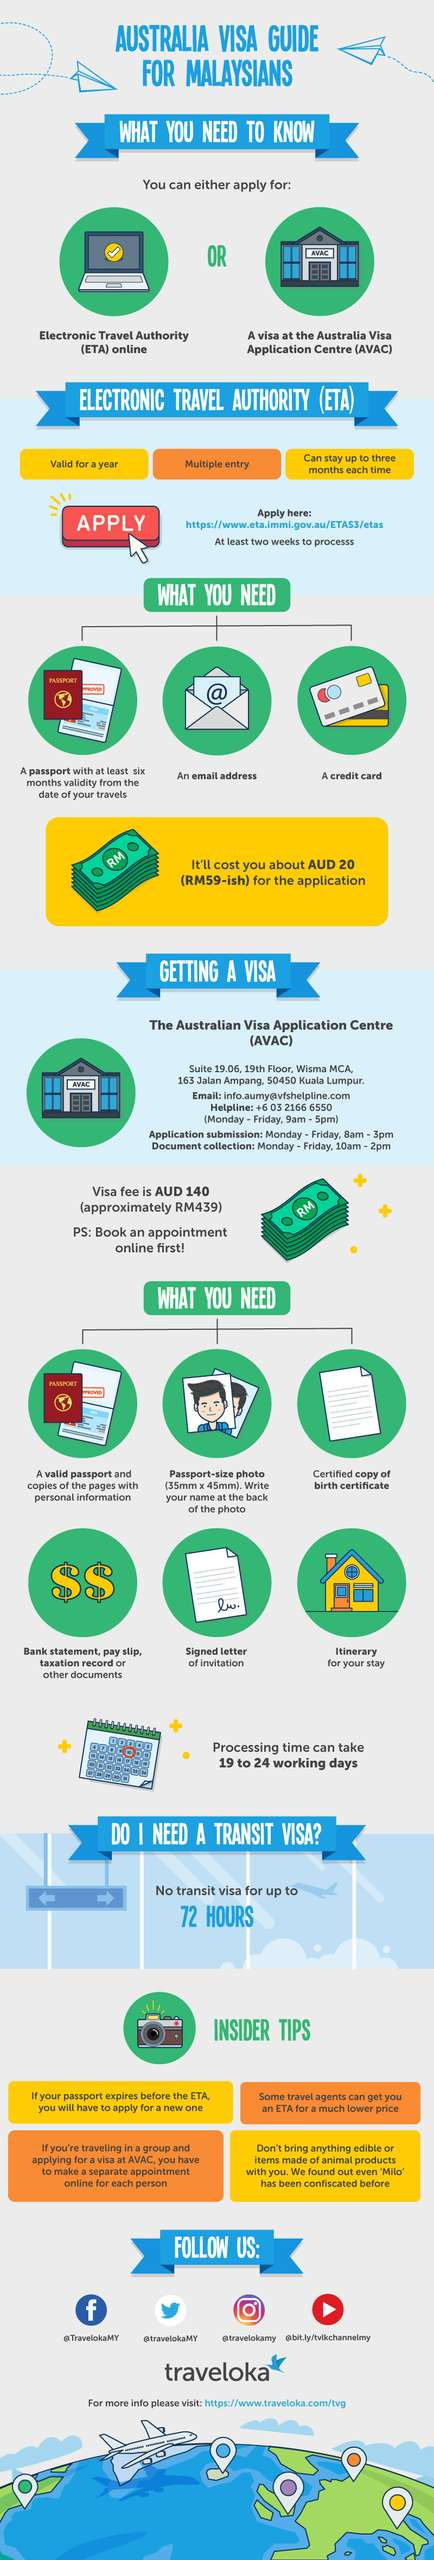 How to Apply Australia Visa Online Infographic